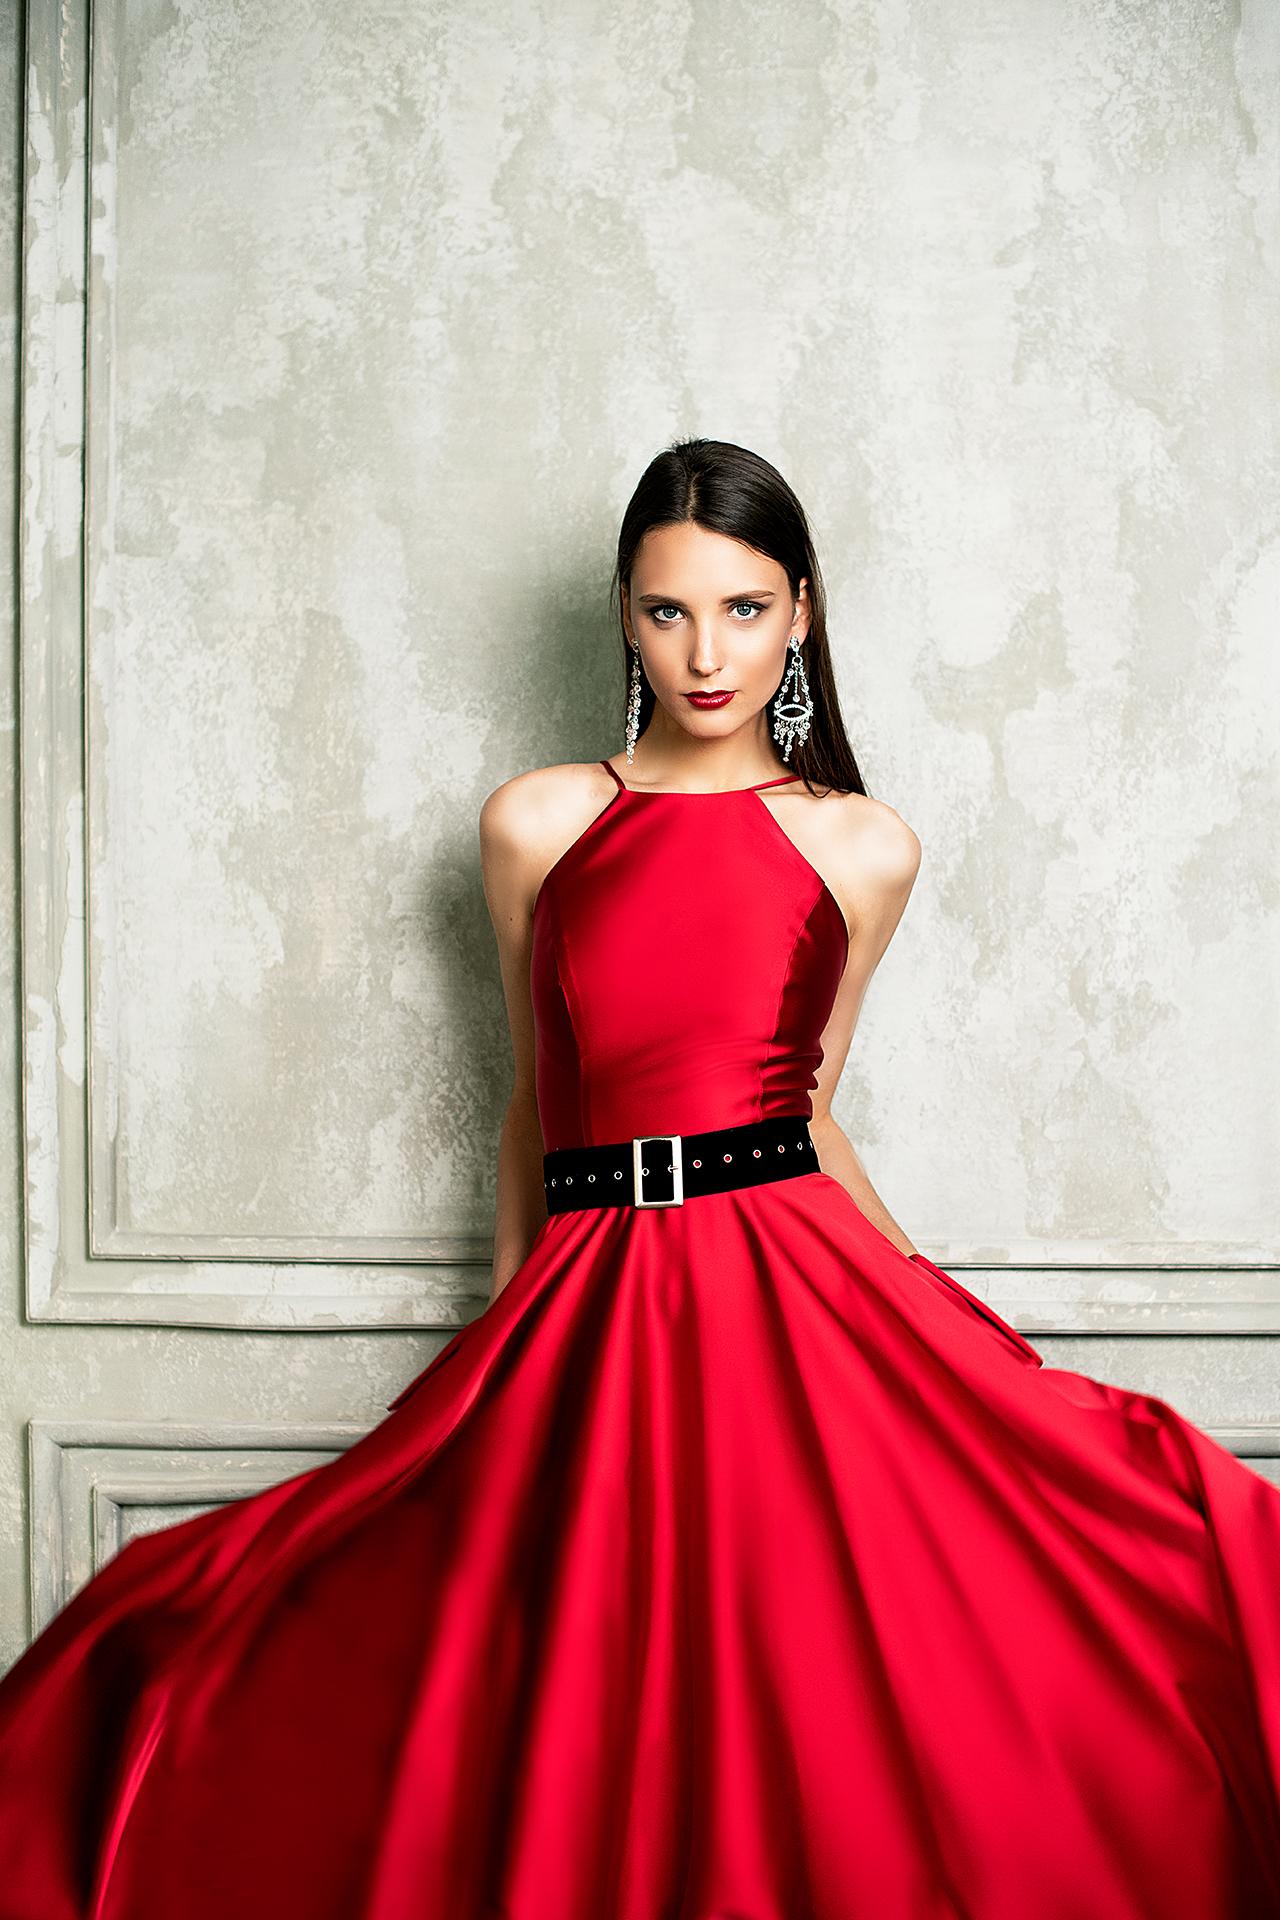 Evening dresses №1361-1 Silhouette  A Line  Color  Red  Neckline  Halter  Sleeves  Sleeveless  Train  No train - foto 2